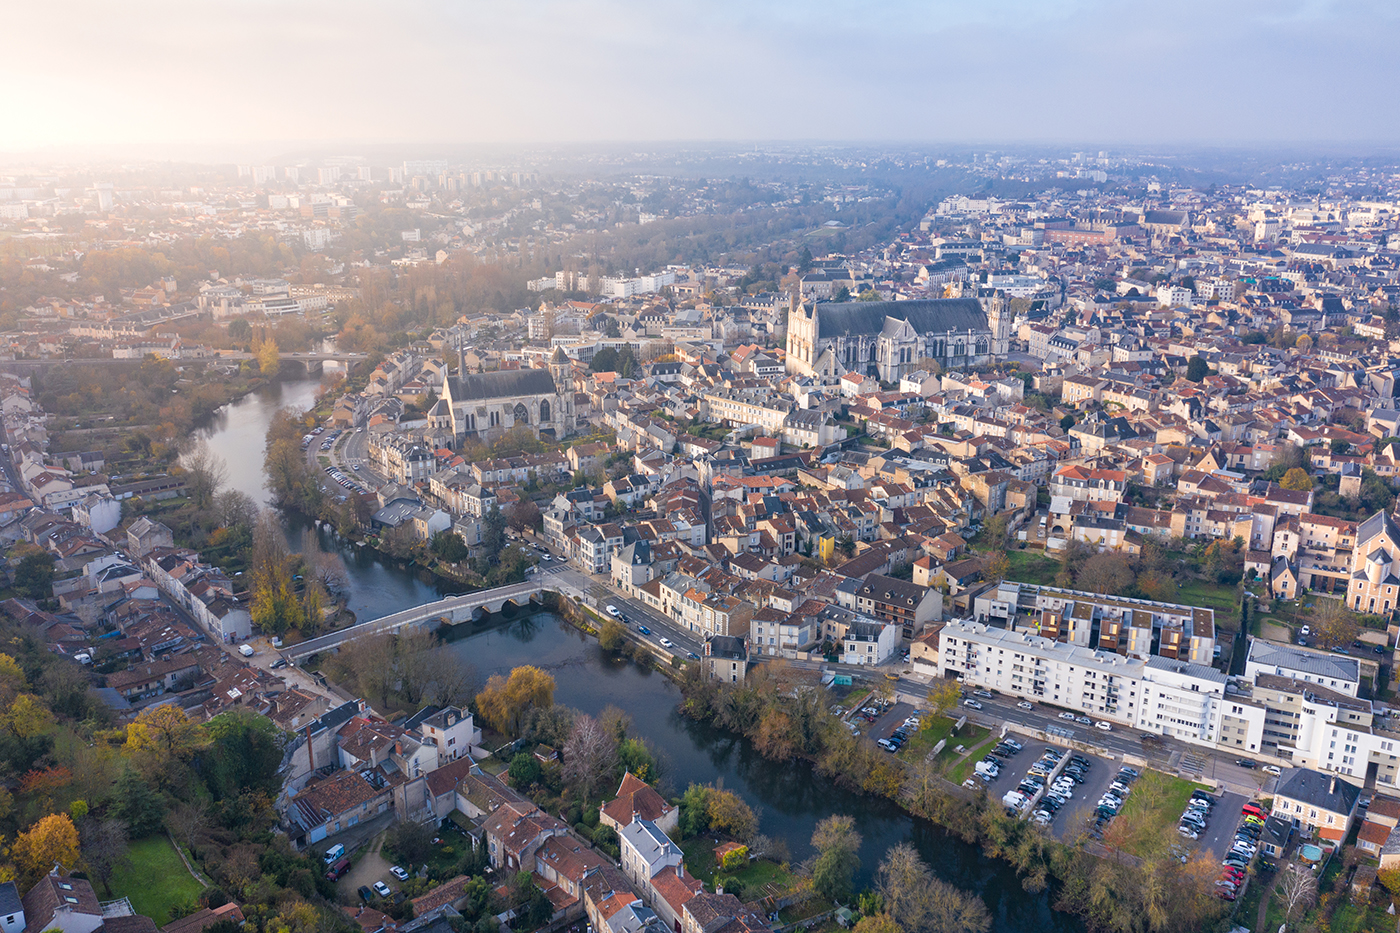 Photographe-professionnel-Poitiers-Drone-Cathedrale-Saint-Pierre-Clain-Pont-Joubert-Guillaume-Heraud